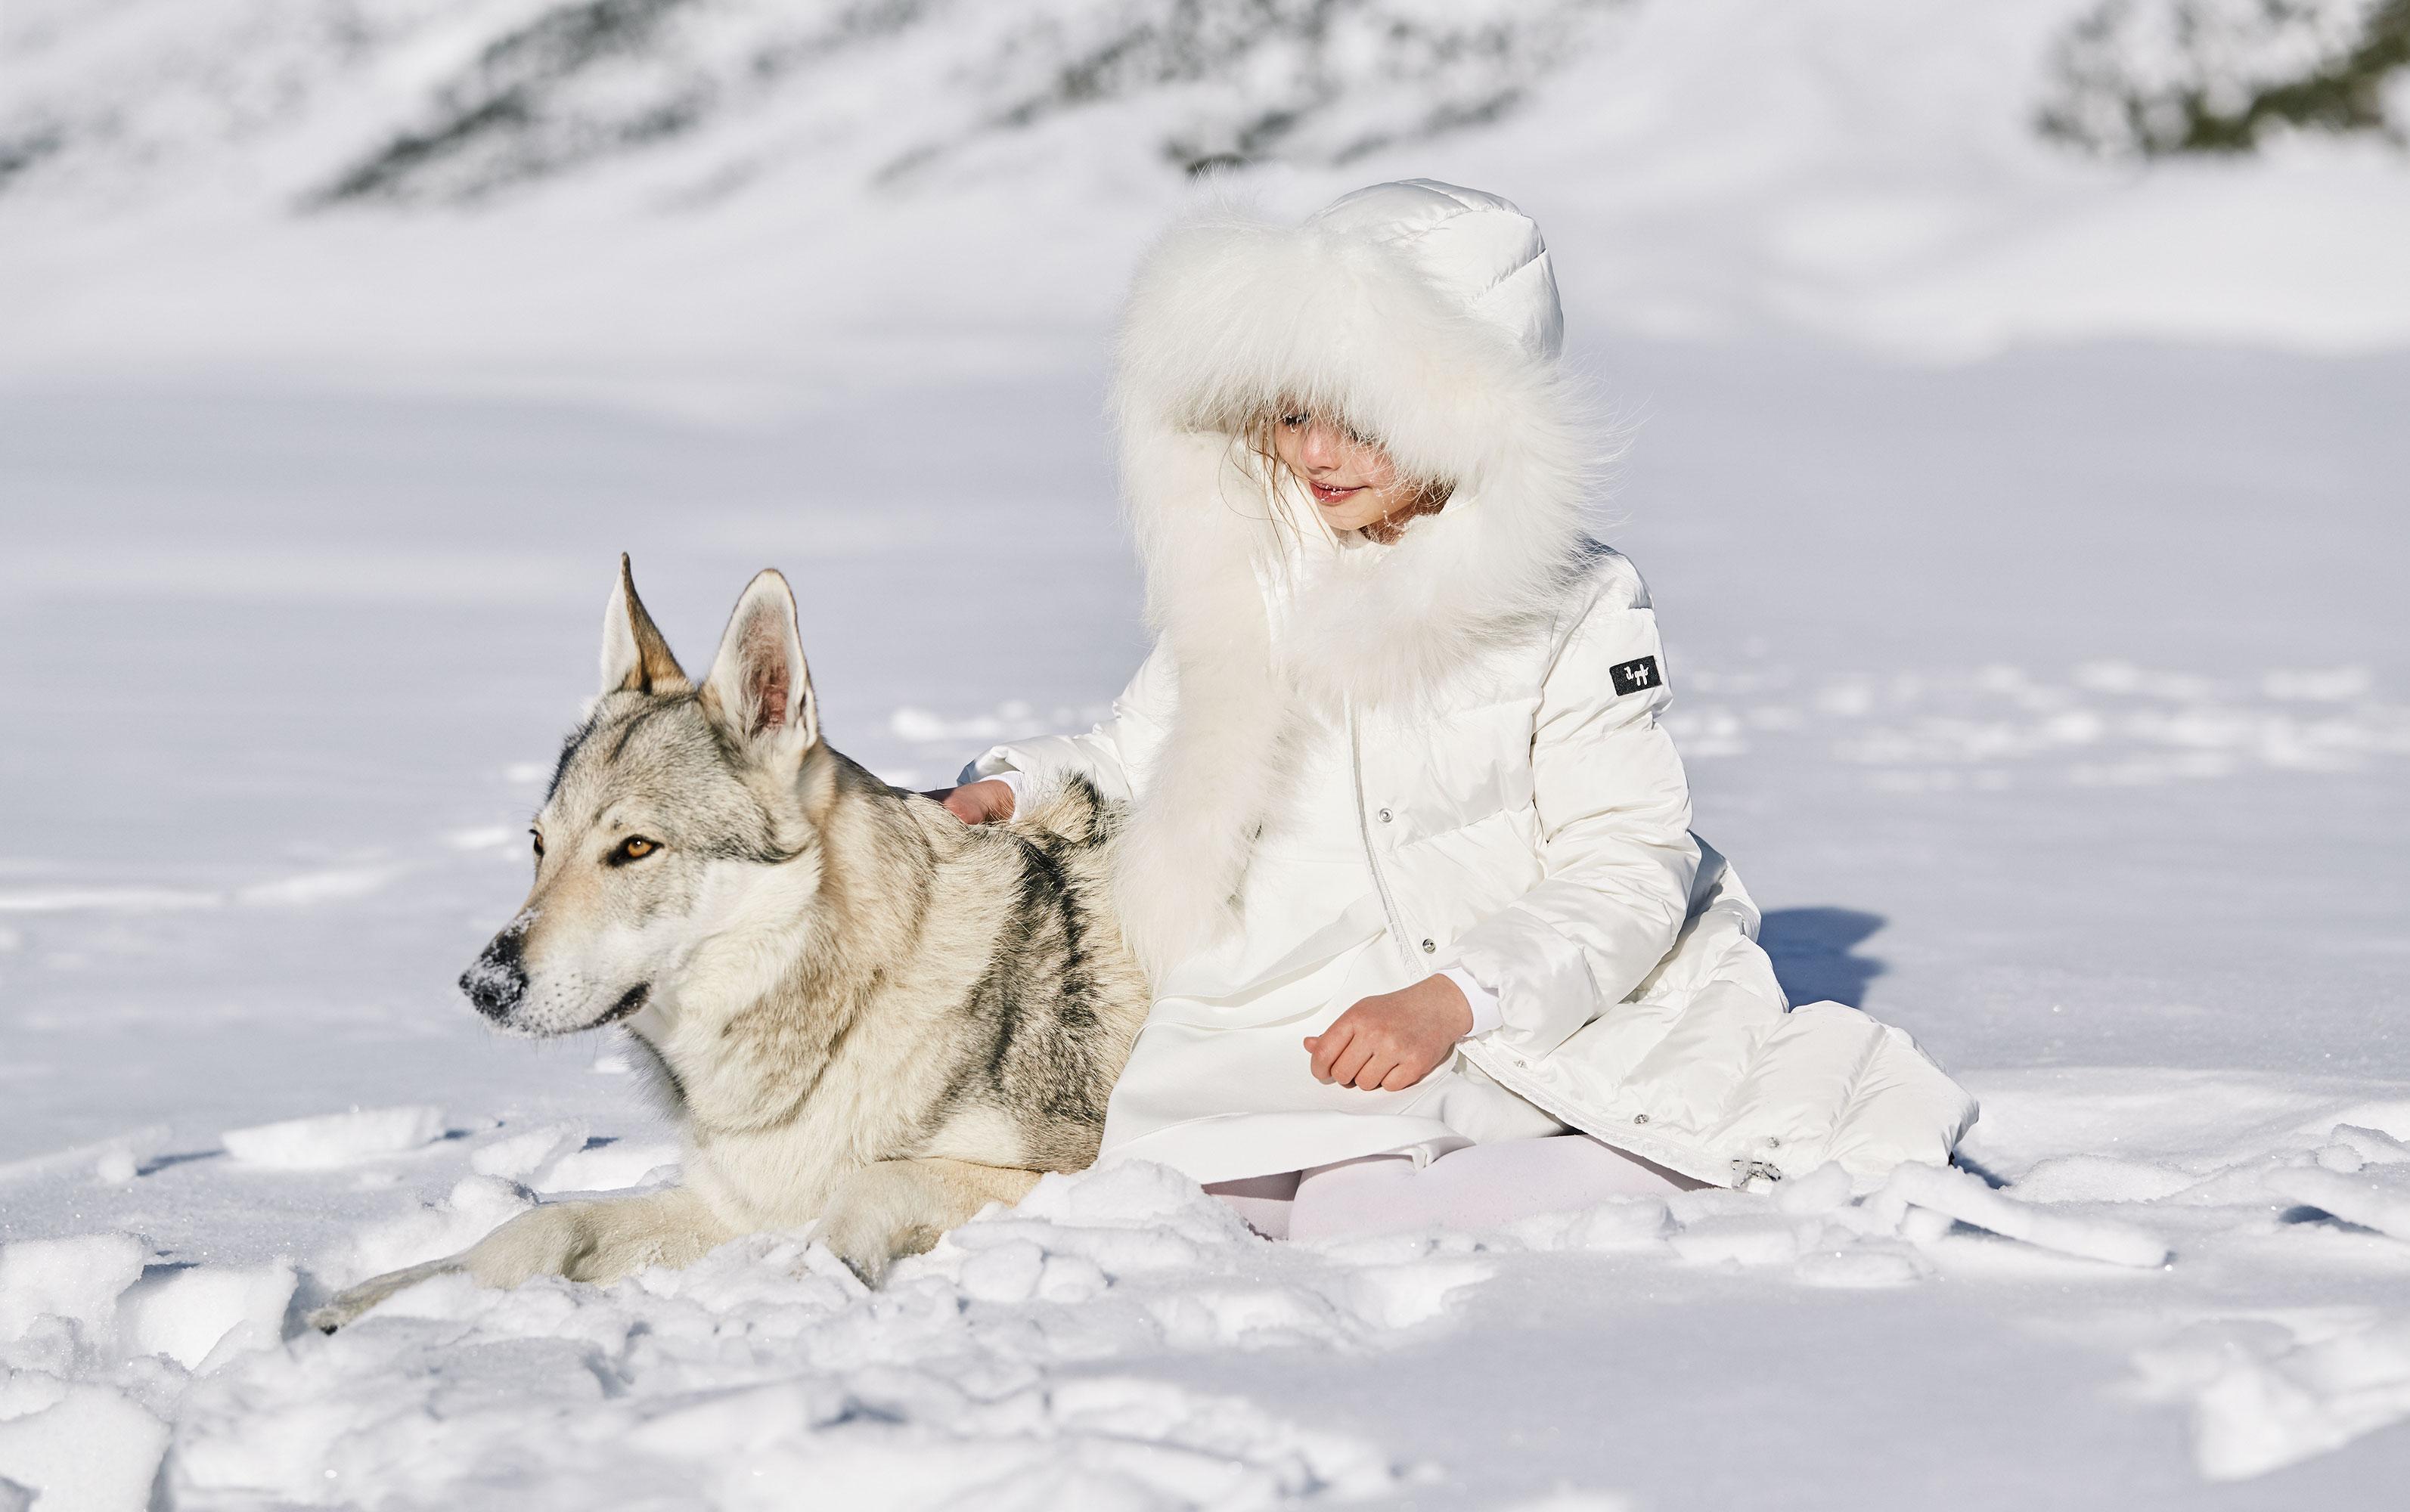 Il Gufo Arctic Wonderland FW 2018 | Serge Guerand | Il Gufo | Numerique Retouch Photo Retouching Studio